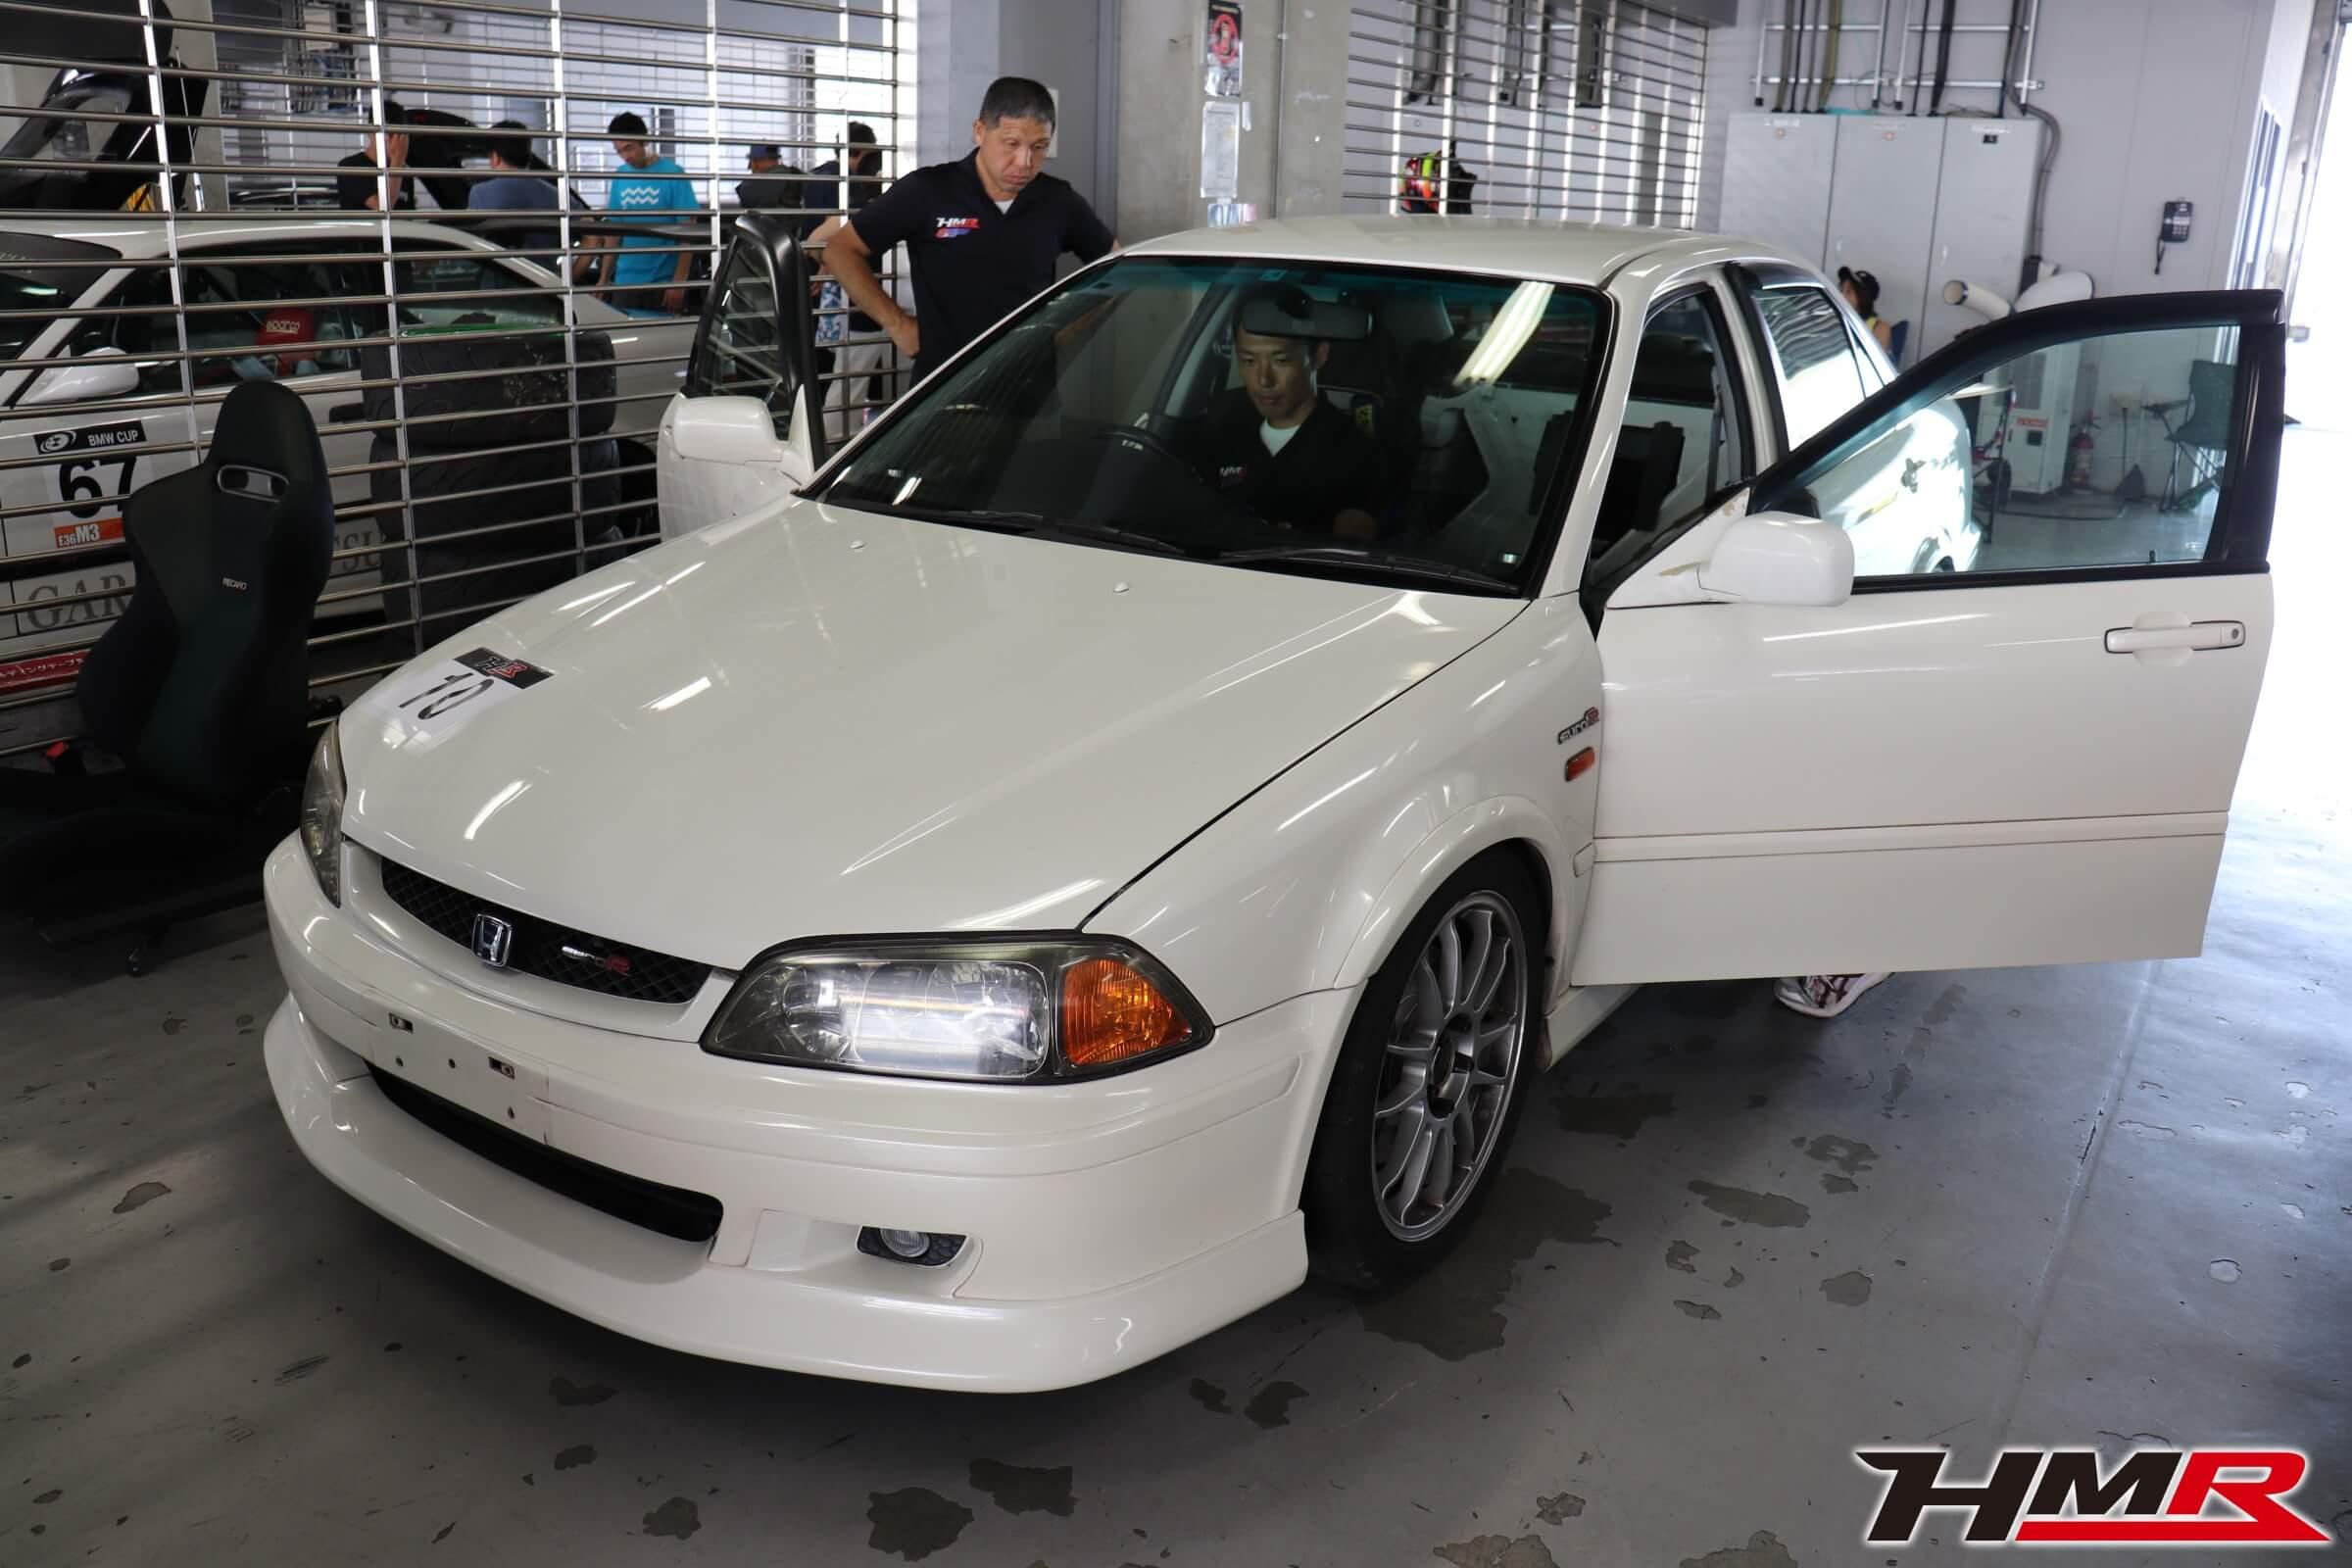 Fuji1-GP CL1レース車両